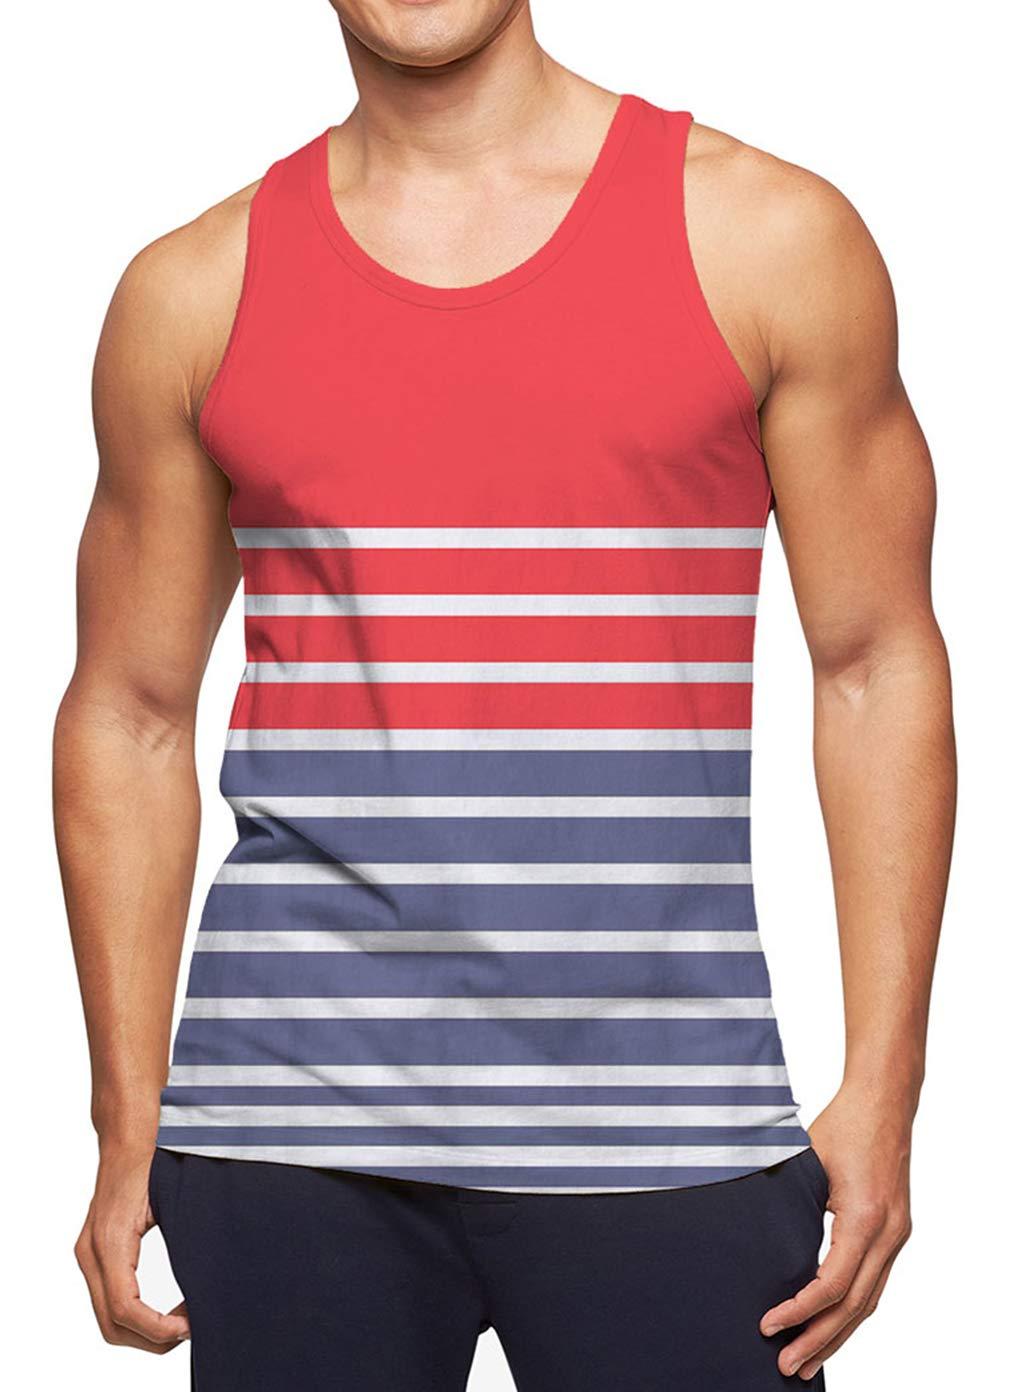 RAISEVERN Men's Tank Tops Summer Sleeveless Tee Cool Workout T-Shirts Fitness Vest Athletic Undershirts